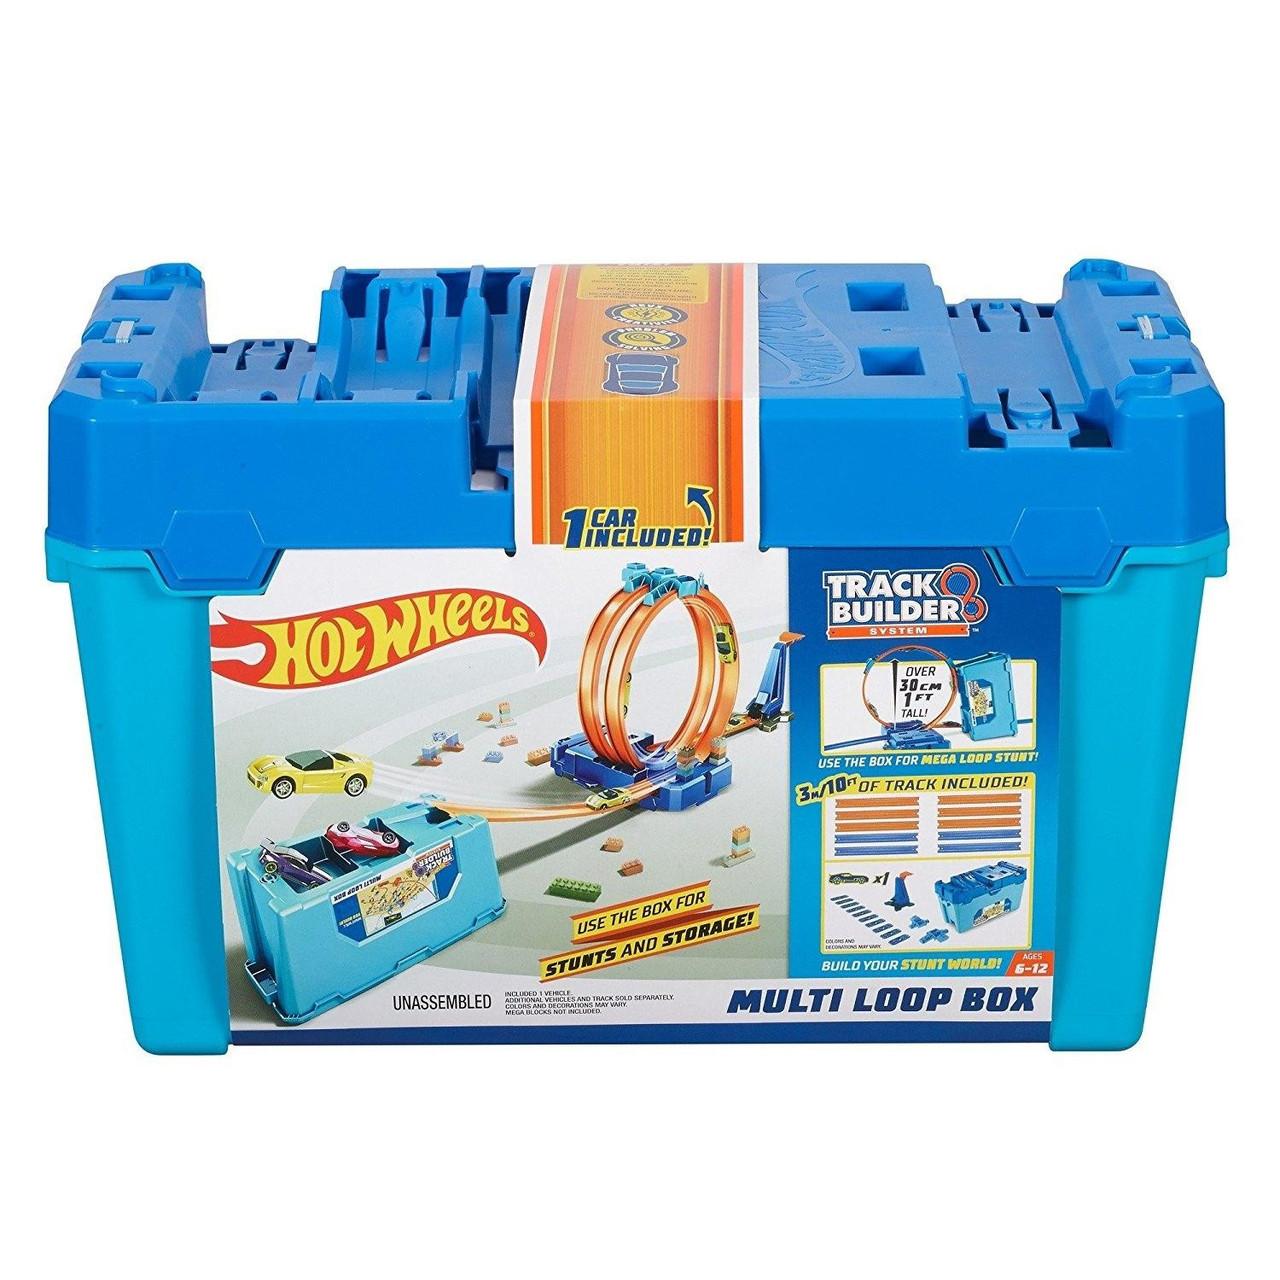 Hot Wheels Track Builder Multi Loop Box Подвійна петля. Хот Вилс Коробка для трюков Двойная петля